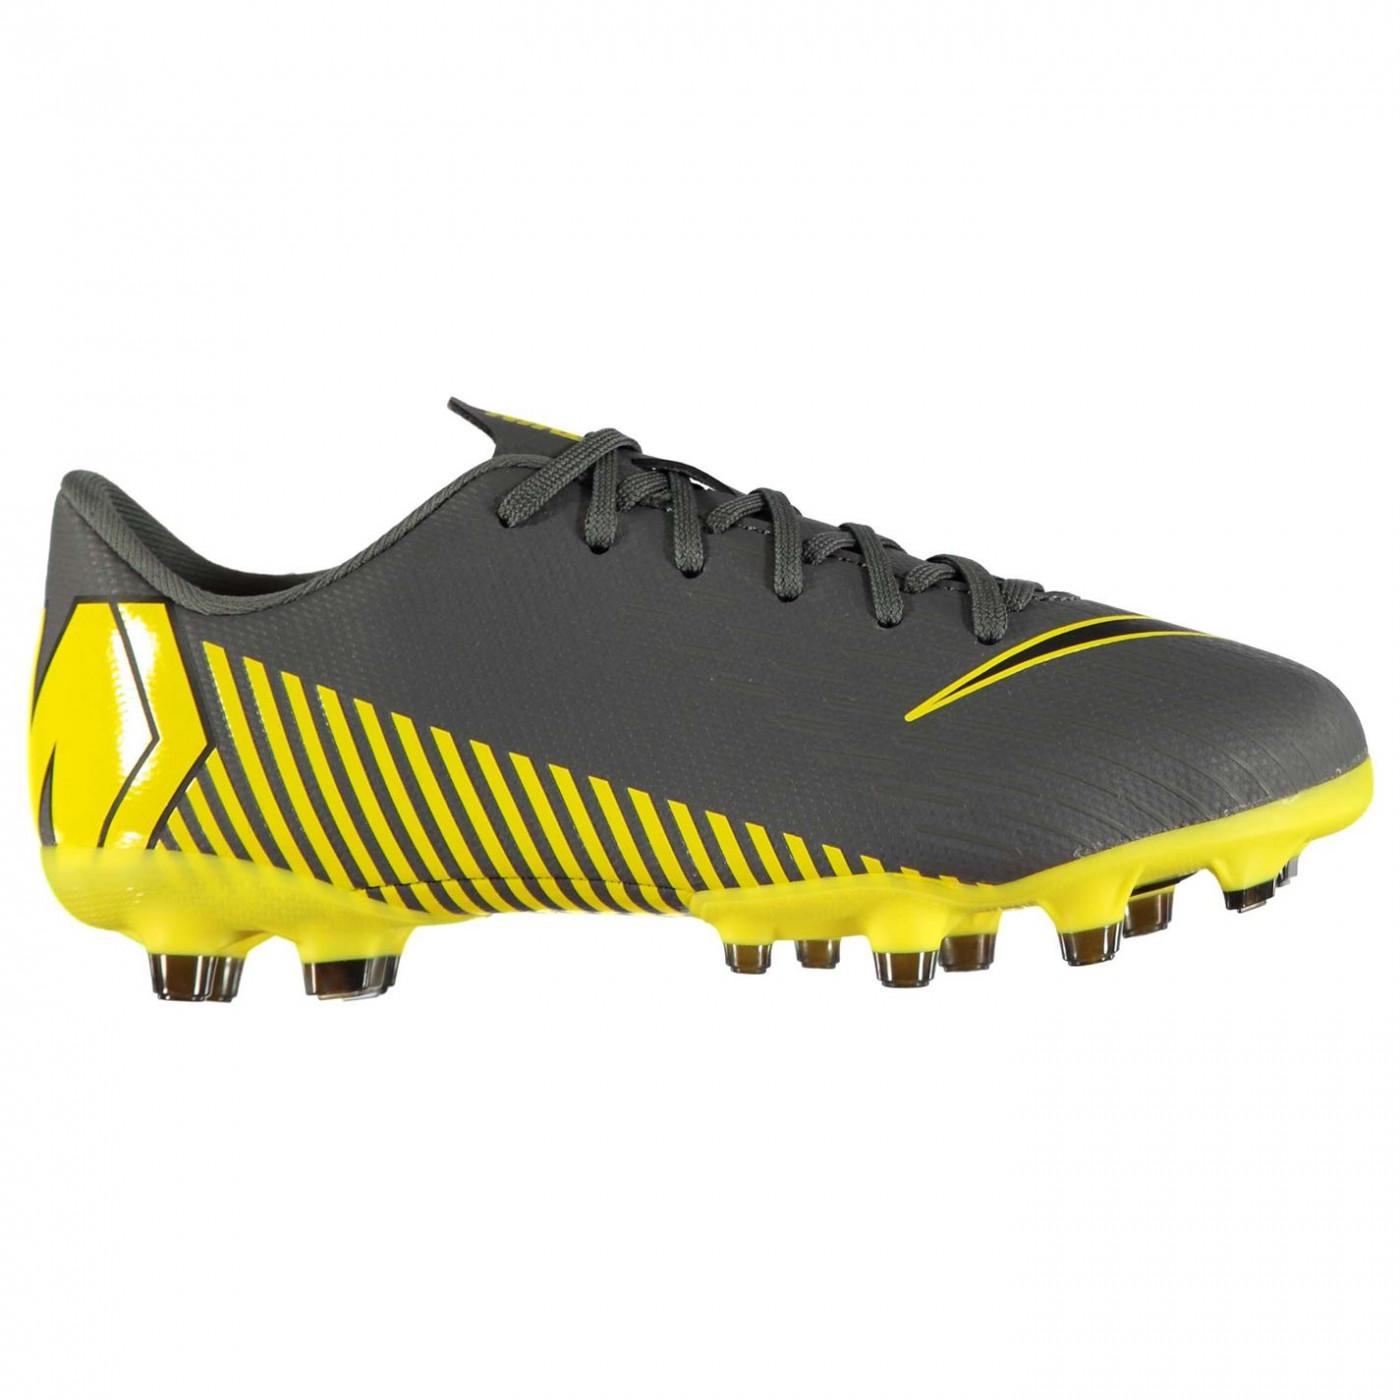 Nike Mercurial Vapor Academy FG Childrens Football Boots